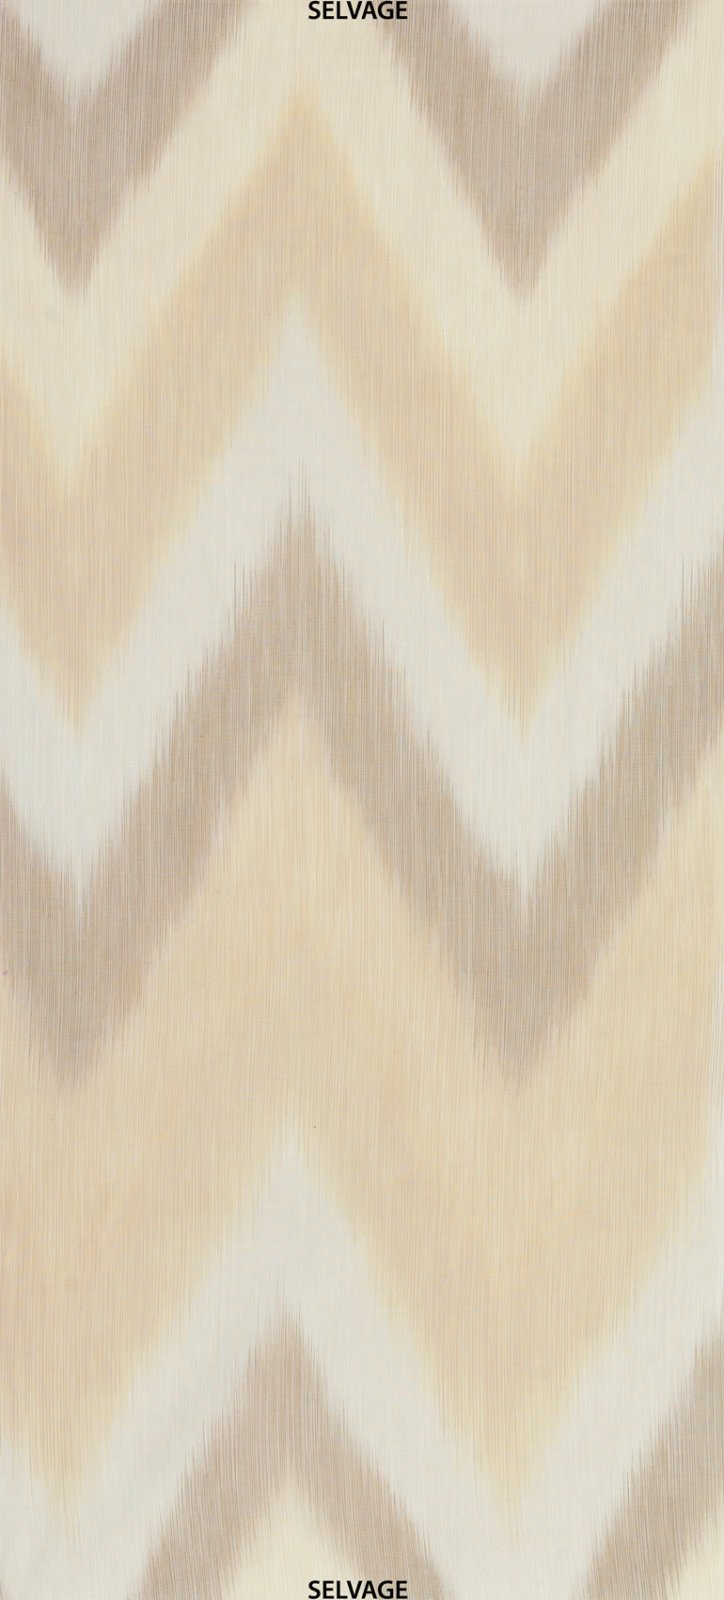 Ikat Basics Cream [Selvedge to Selvedge] C4748-CREAM